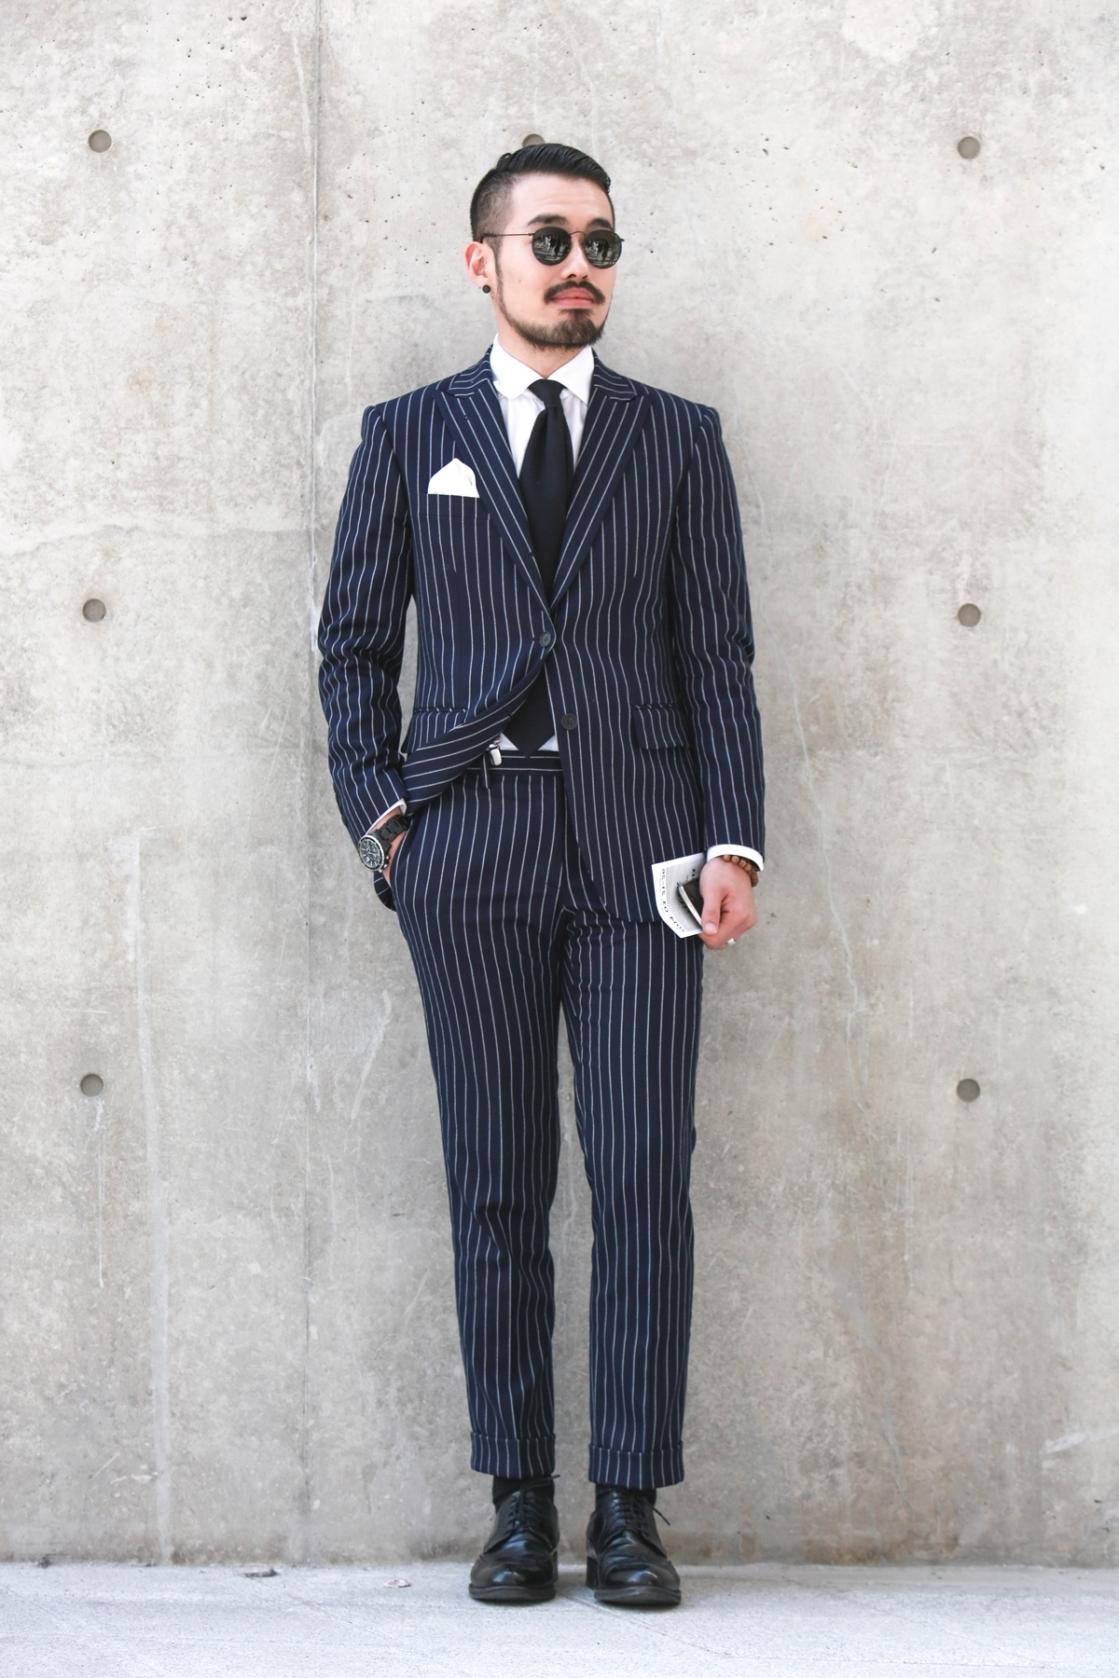 Korean Fashion Sauit Classic Style For Men The Style Amp Fashion Blogh Classic Men's Fashion Blogl Appealing Classic Men's Fashion Blogf - MF